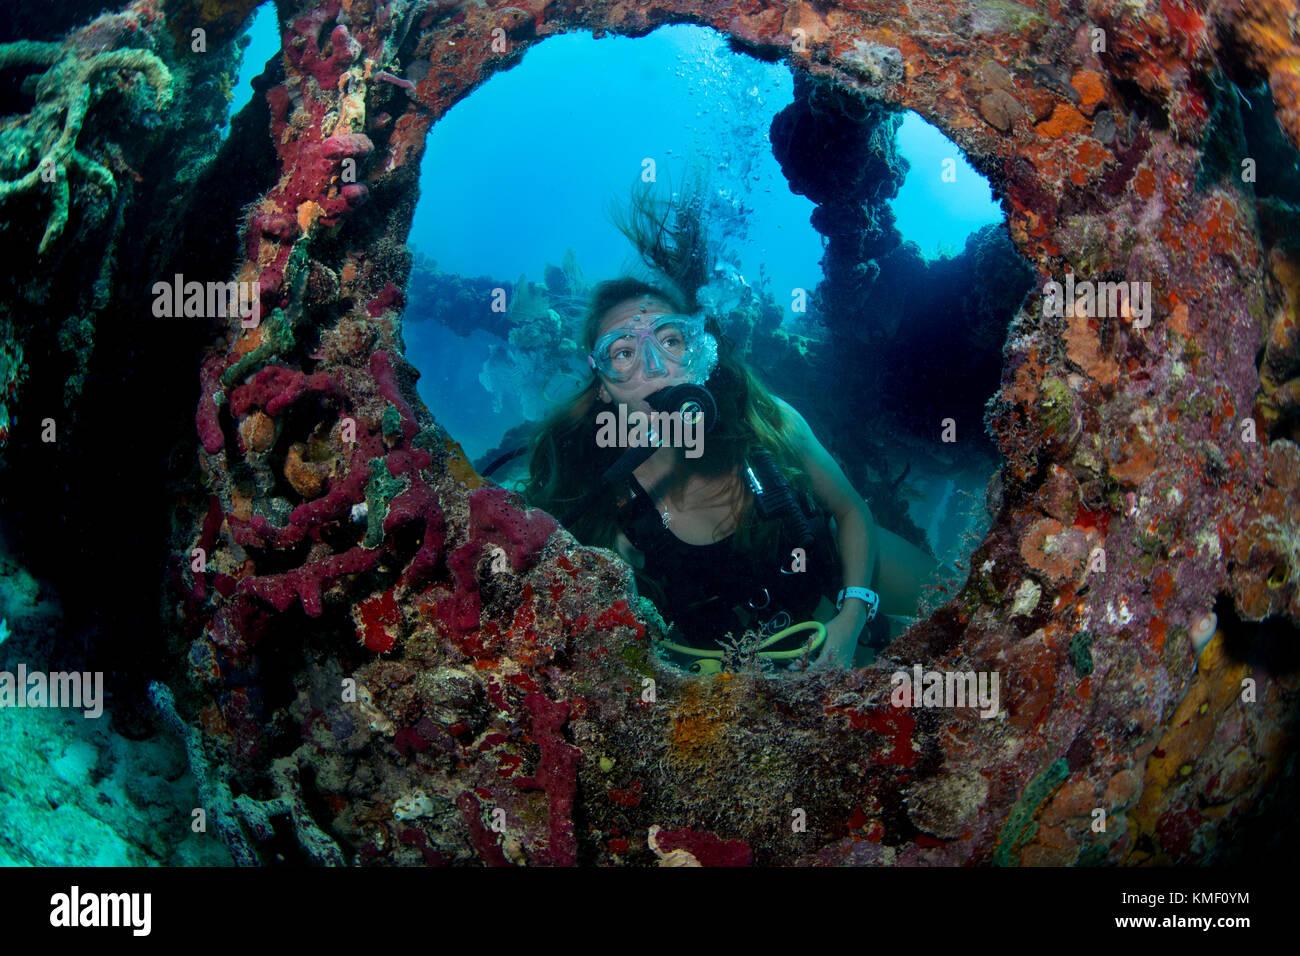 Scuba Diver explora las ruinas de Flagler's Barge. Foto de stock